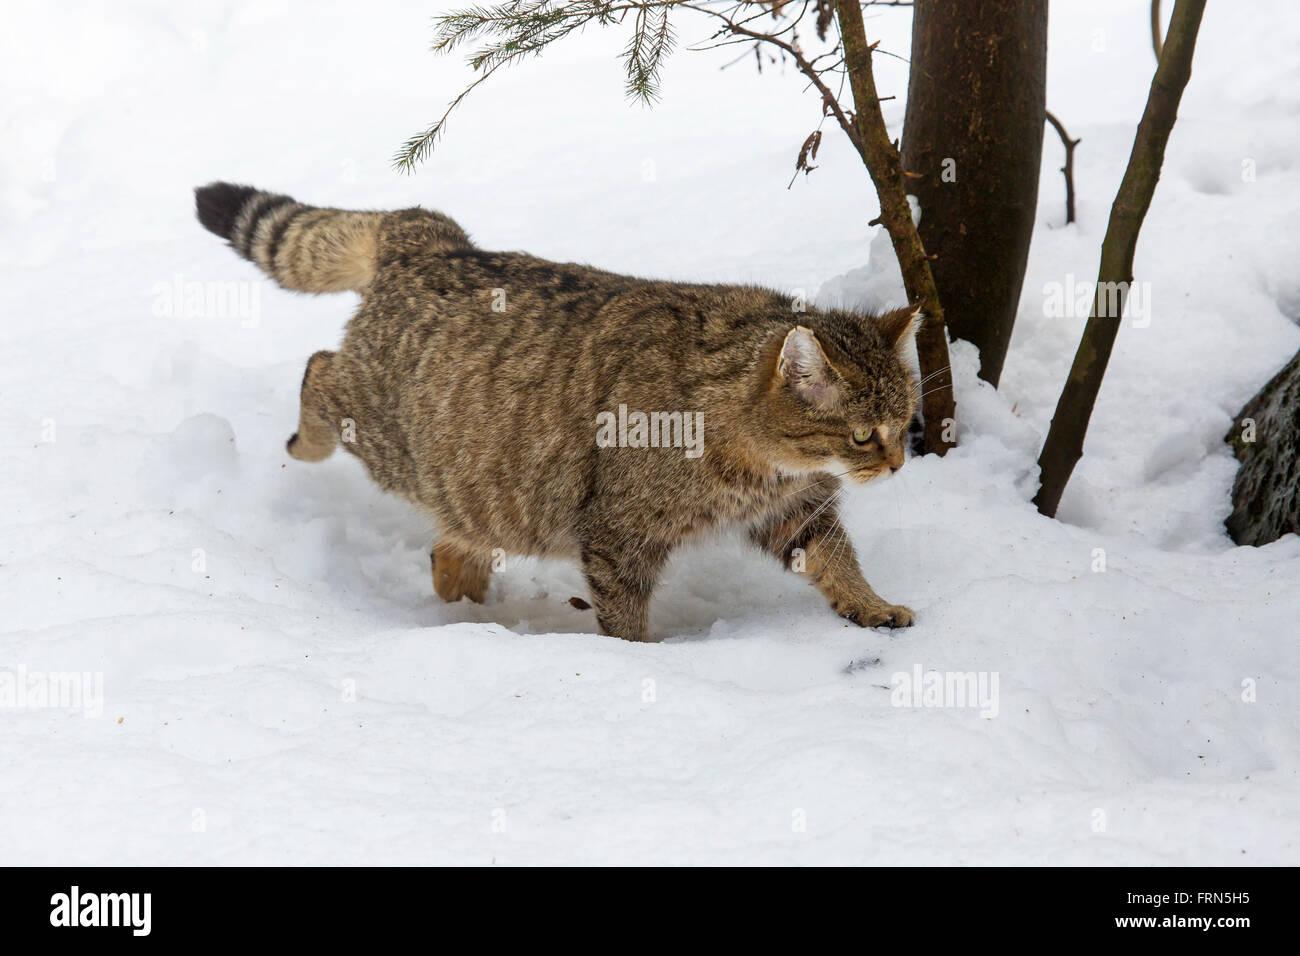 Pregnant European wild cat (Felis silvestris silvestris) walking in the snow in winter Stock Photo